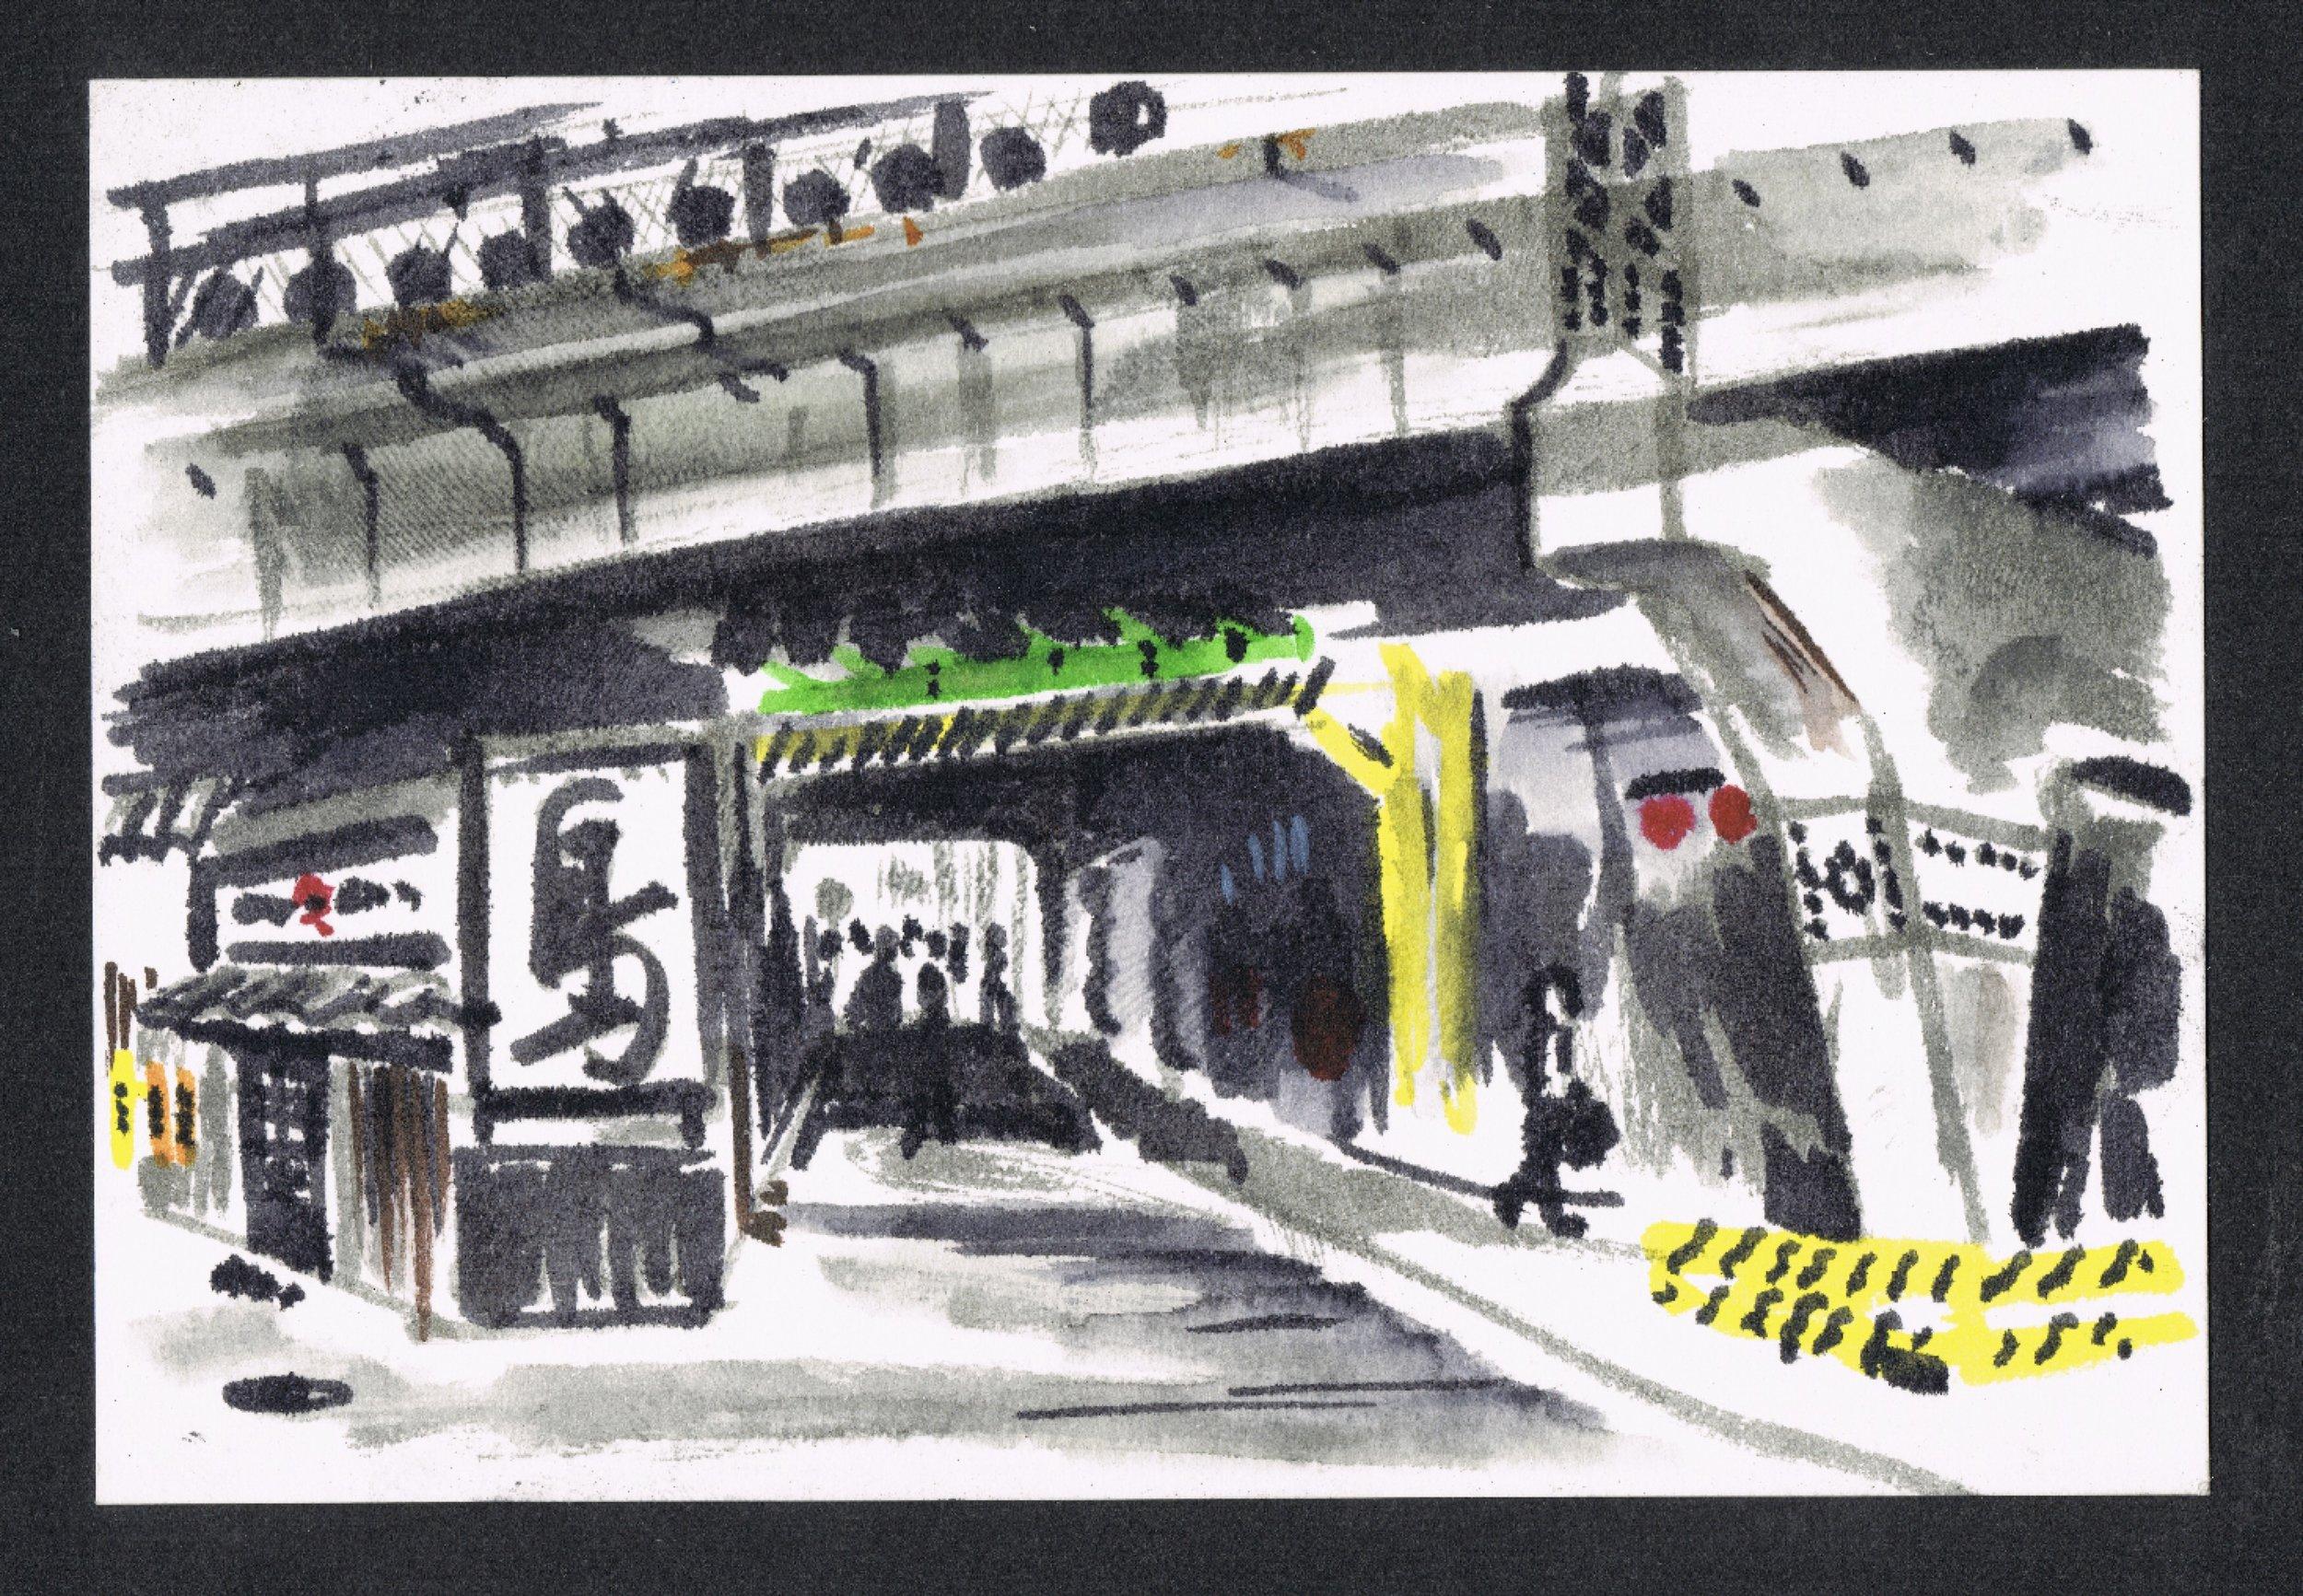 Bullet train flying over yakitori places at  Shinbashi Station  in Tokyo